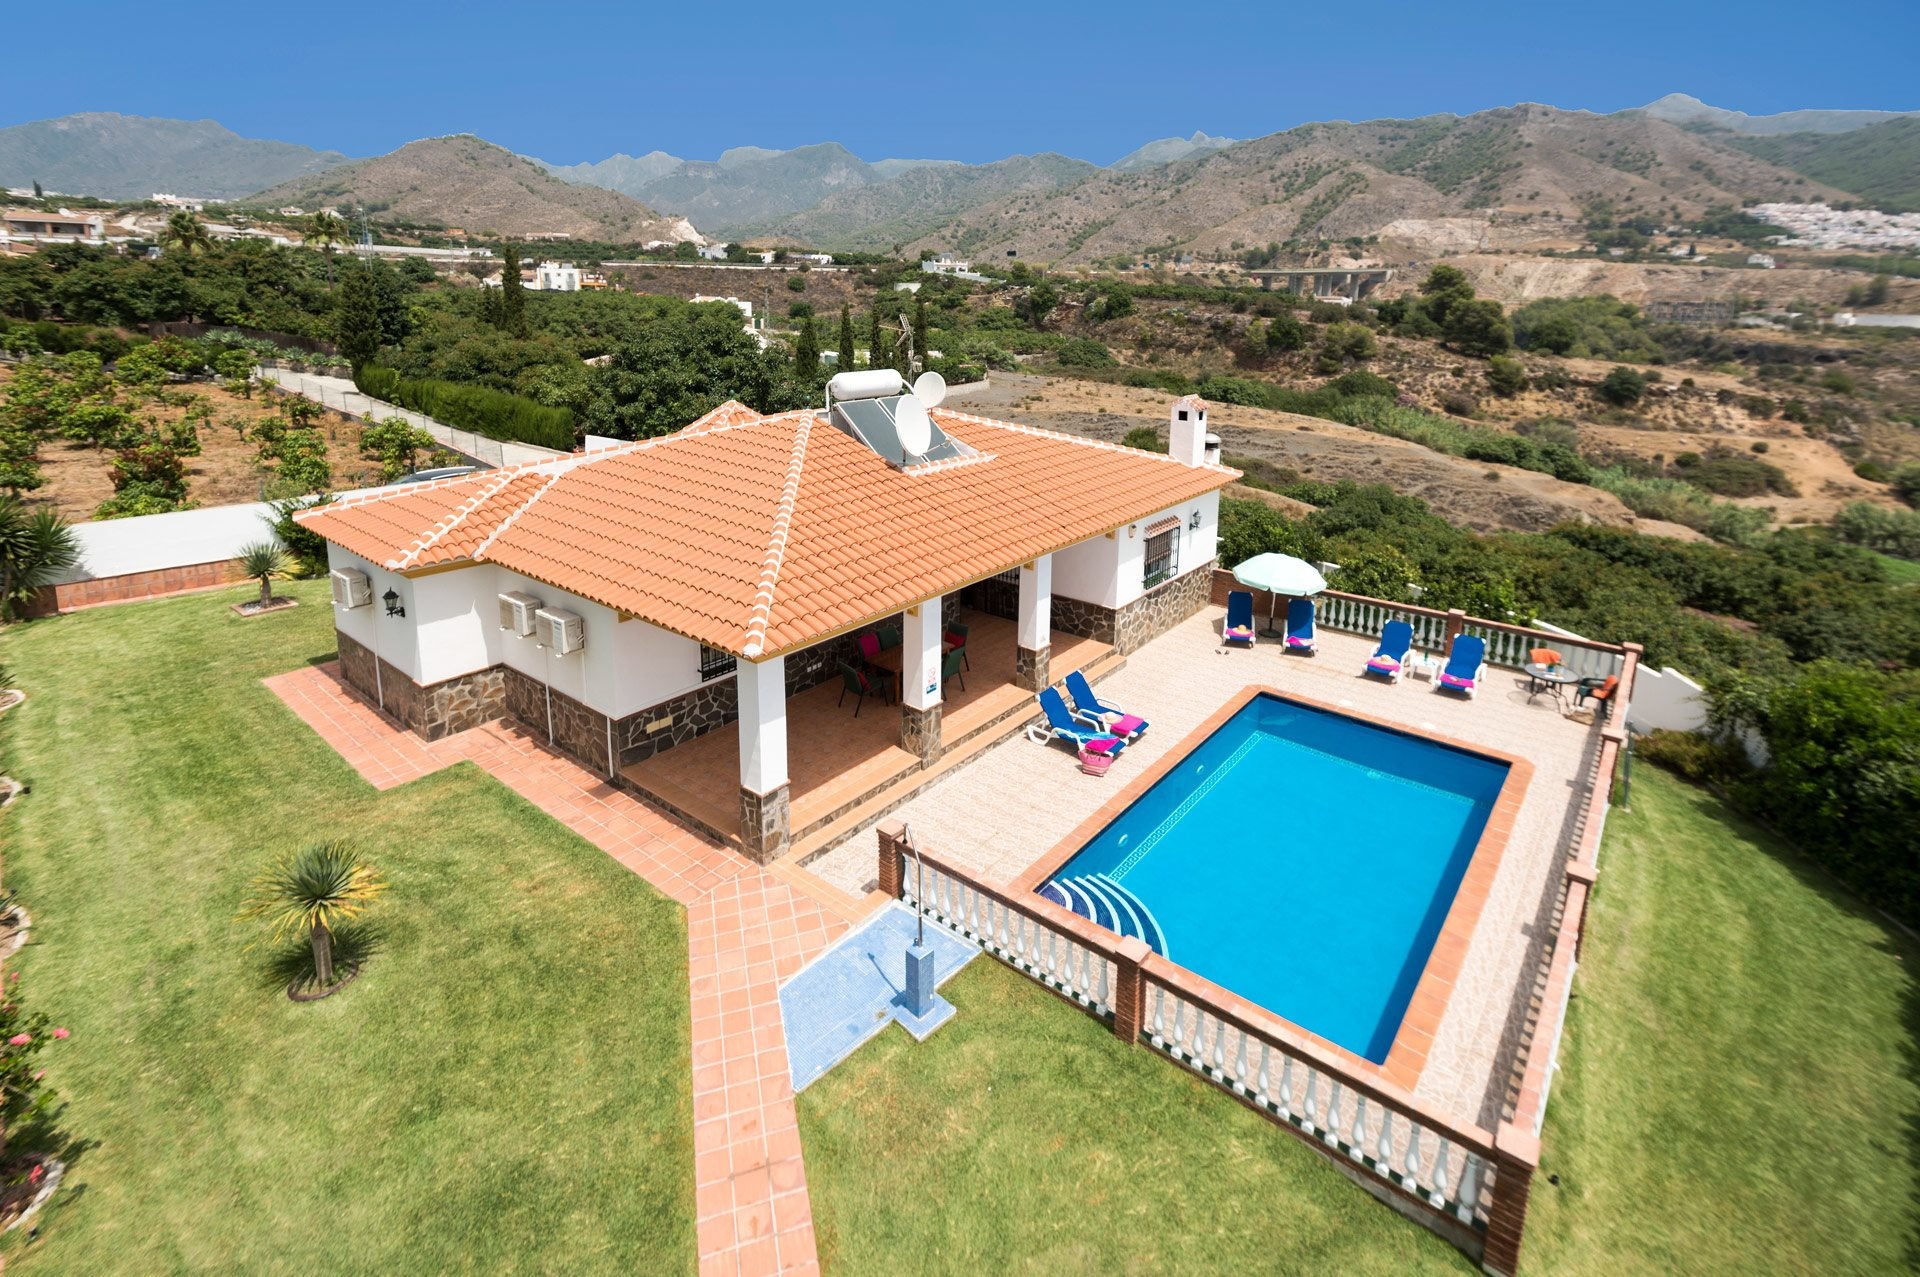 Villa Laura Sol, Nerja, Andalucia, Spain